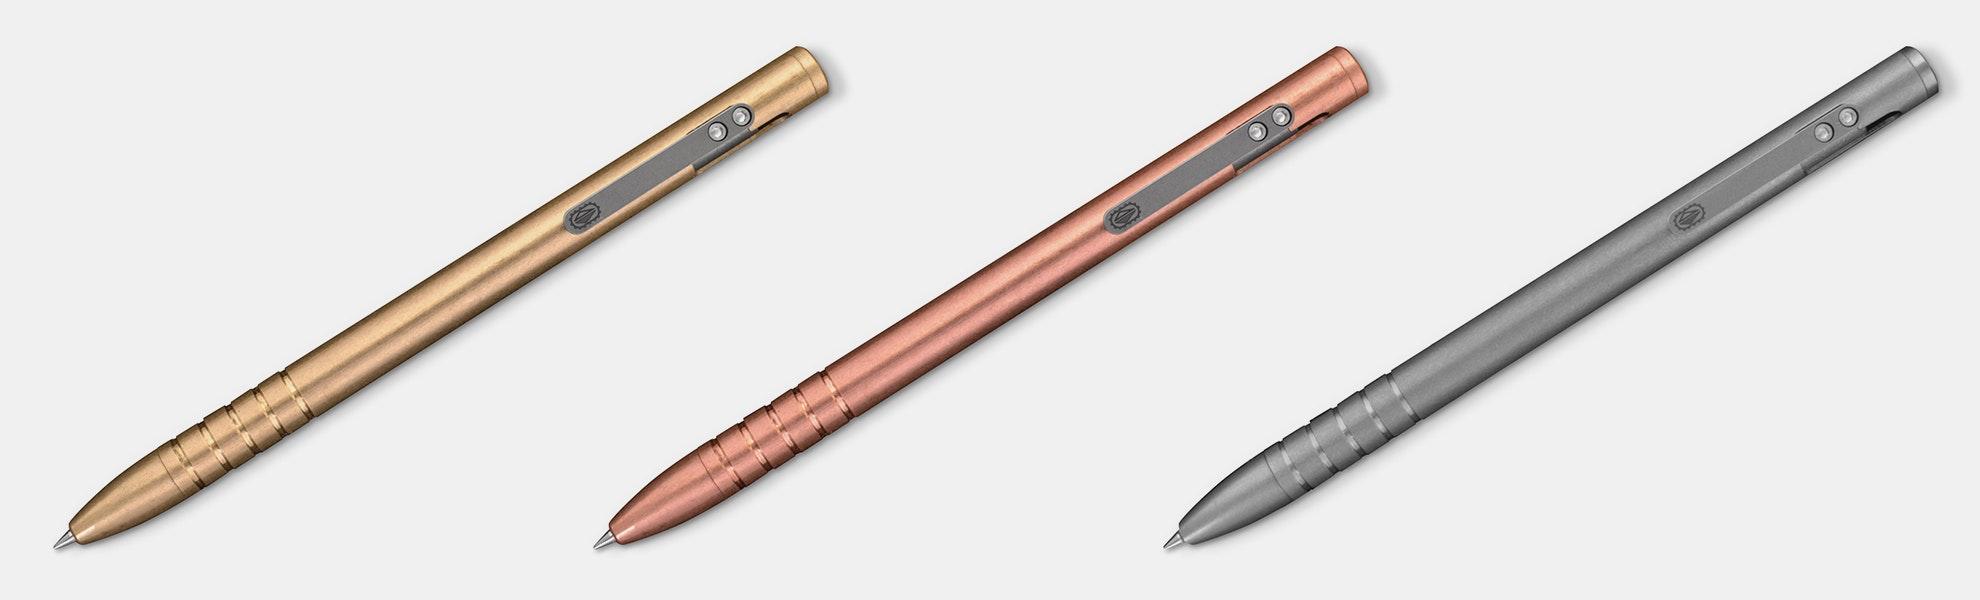 Urban Survival Gear TiScribe-Bolt Pens (Version 2)